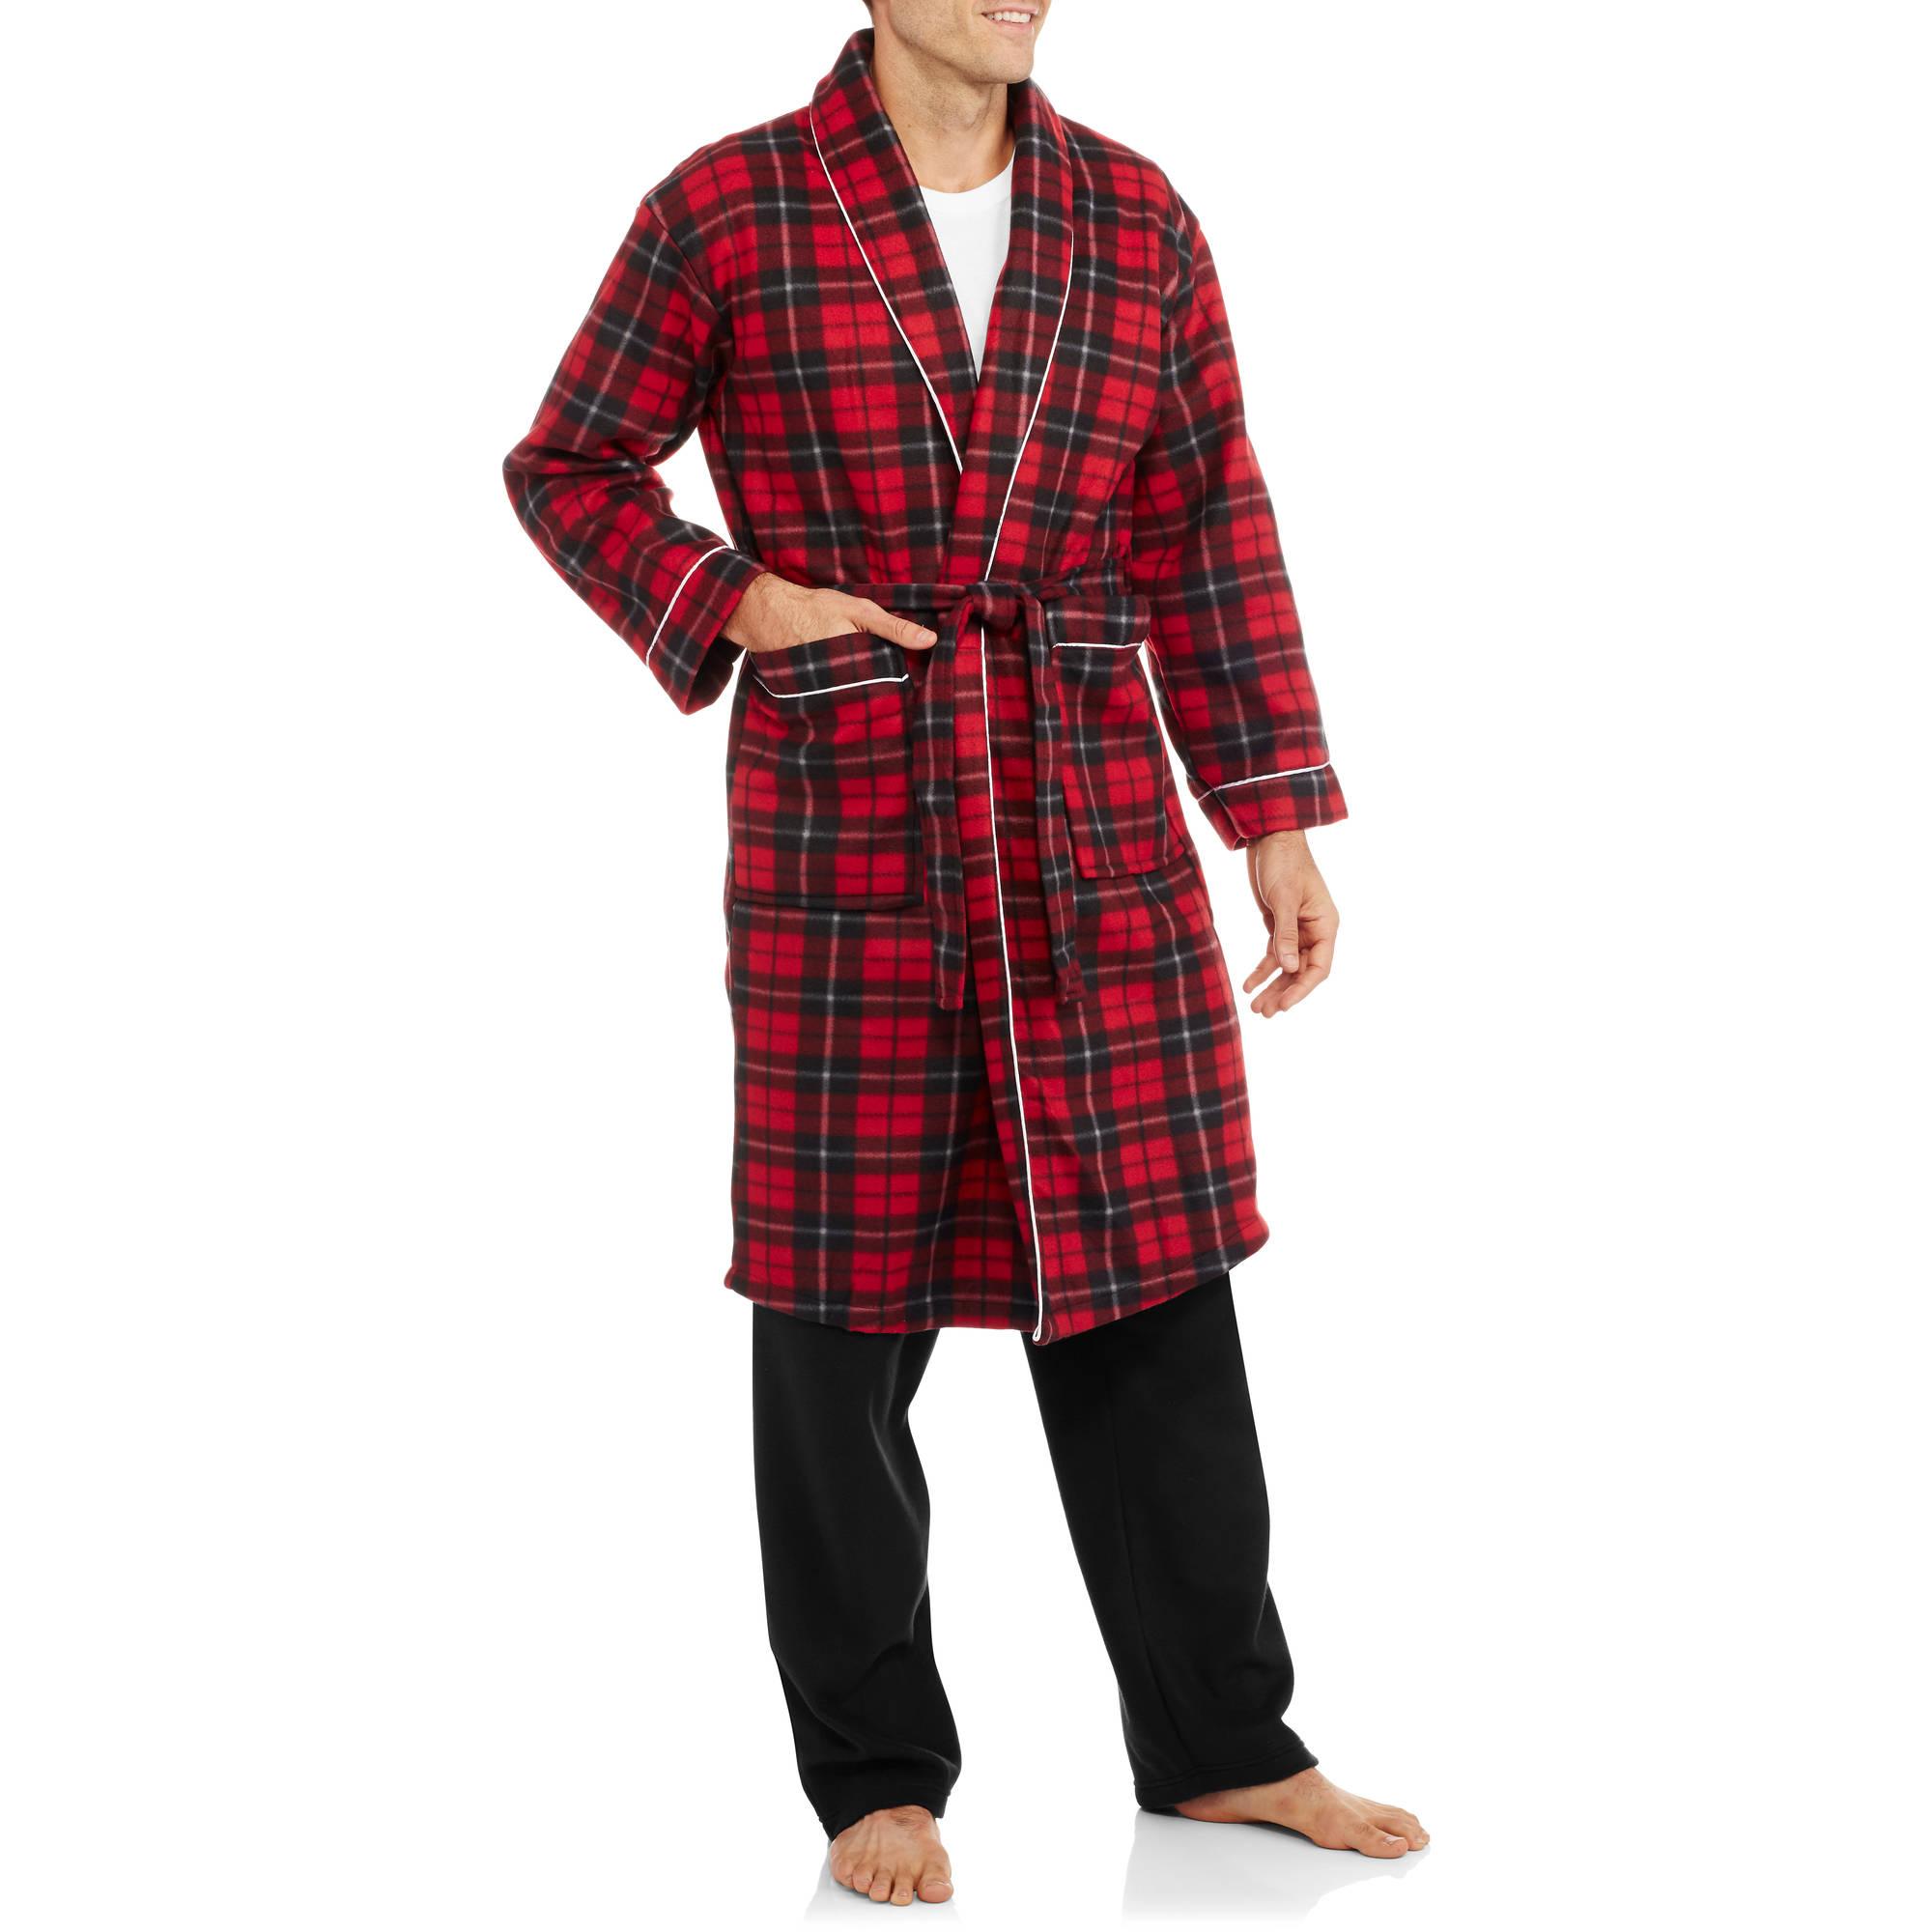 Men's Plaid Printed Polar Fleece Robe